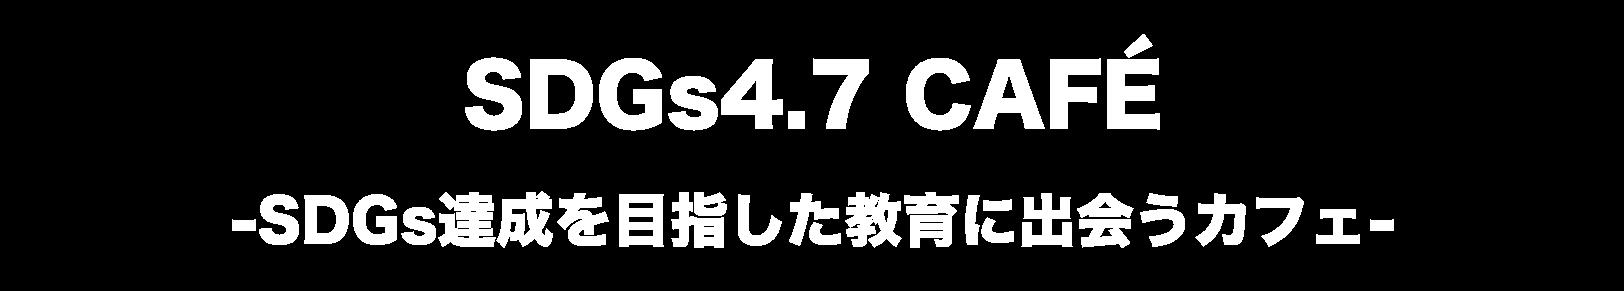 SDGs4.7カフェ